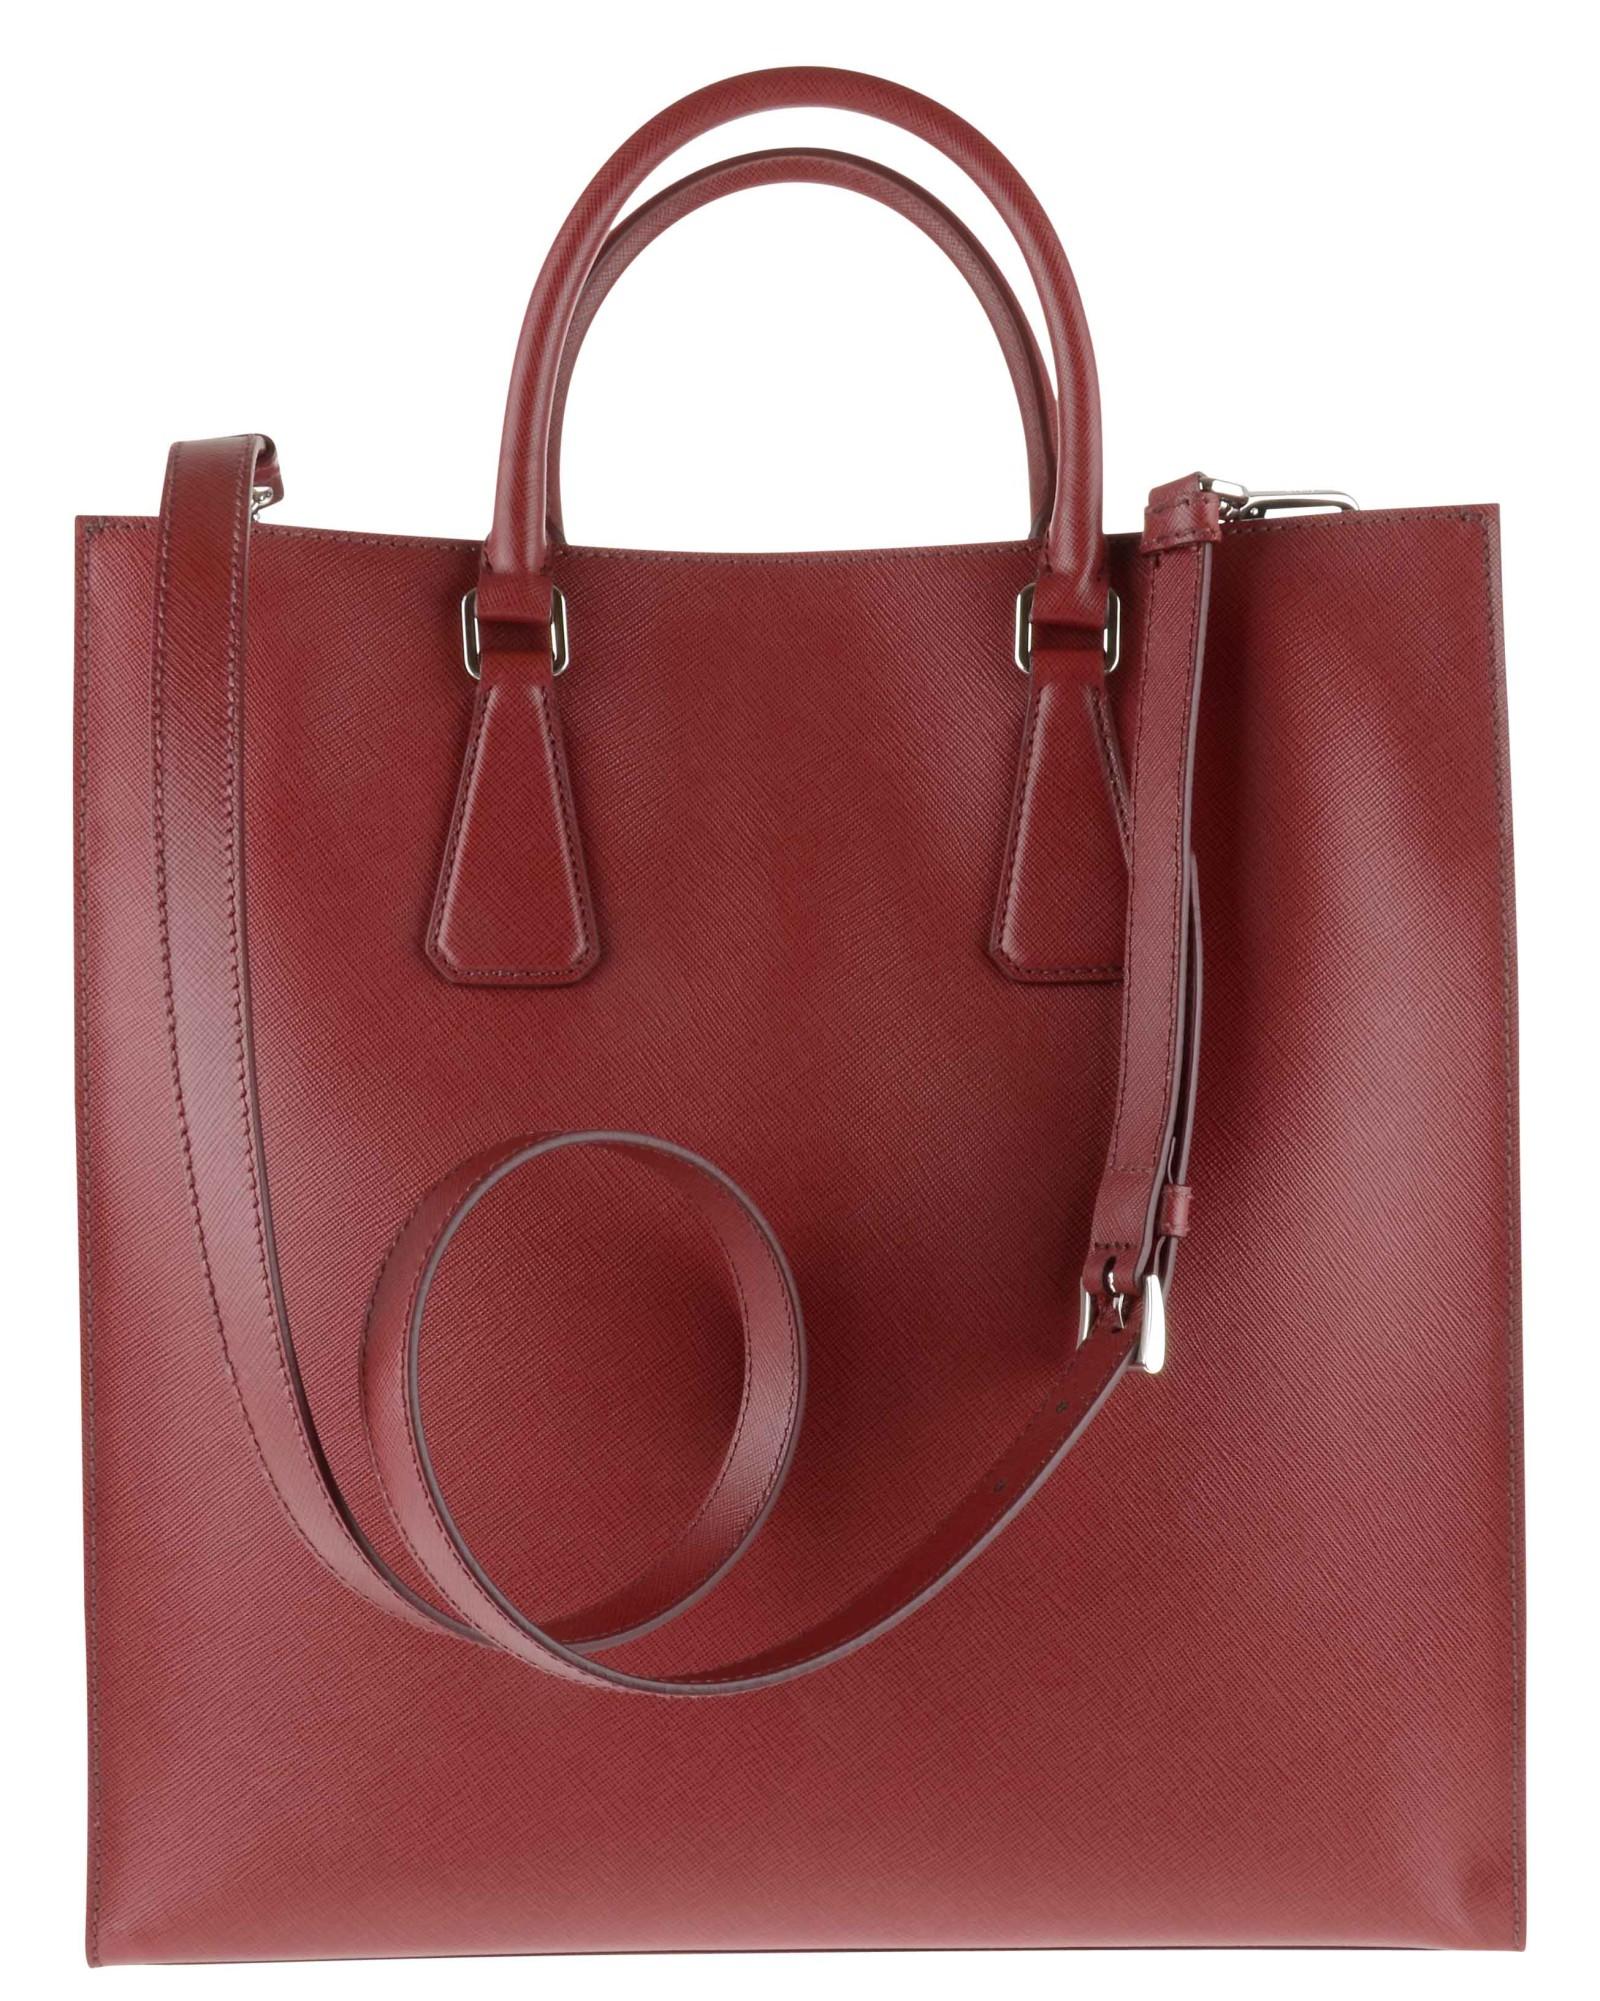 borsa prada shop online prada leather purse prices. Black Bedroom Furniture Sets. Home Design Ideas